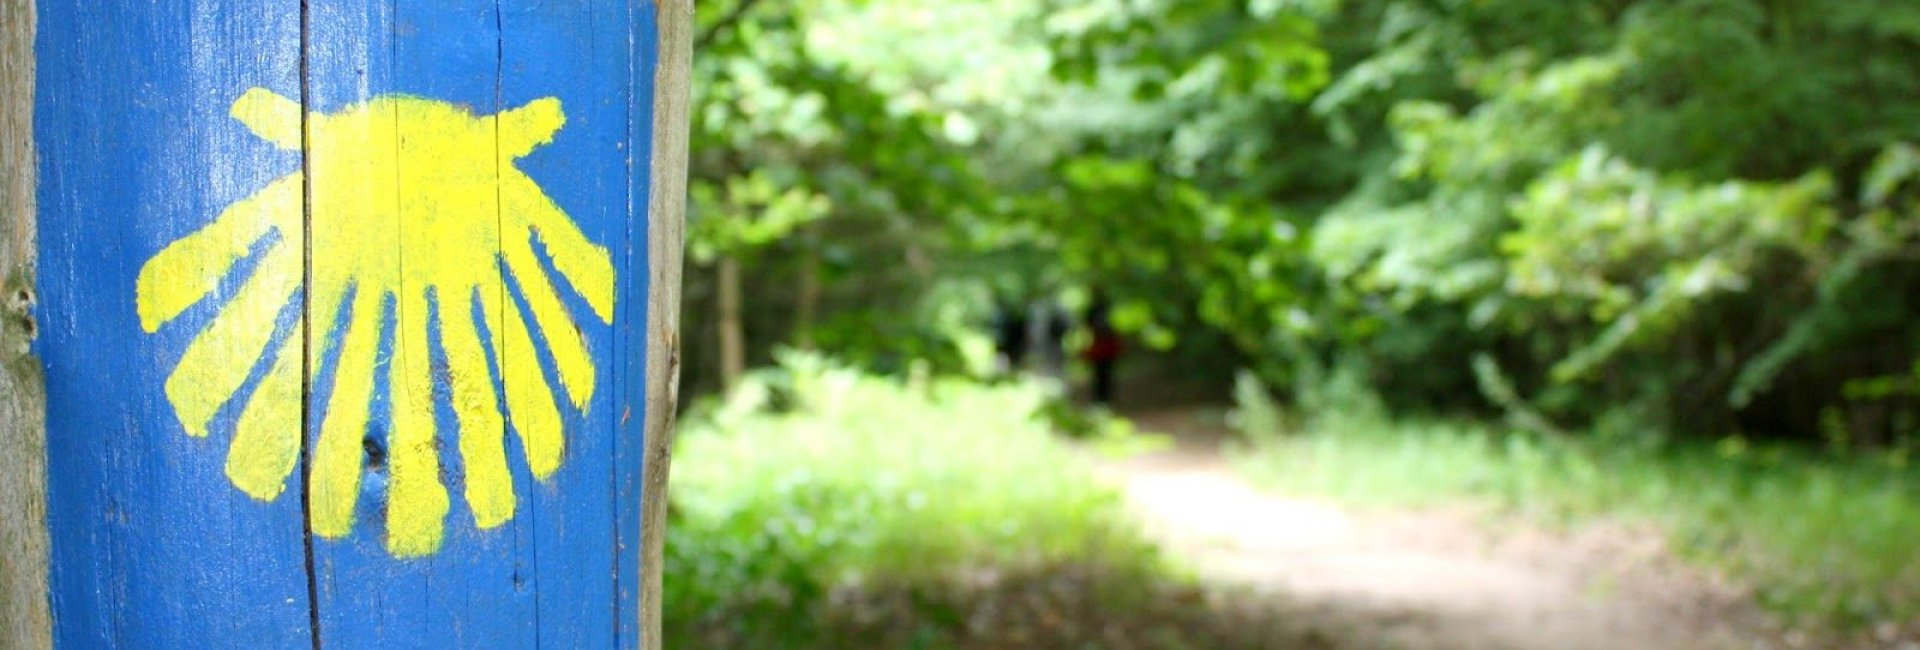 Walking trail - St. James